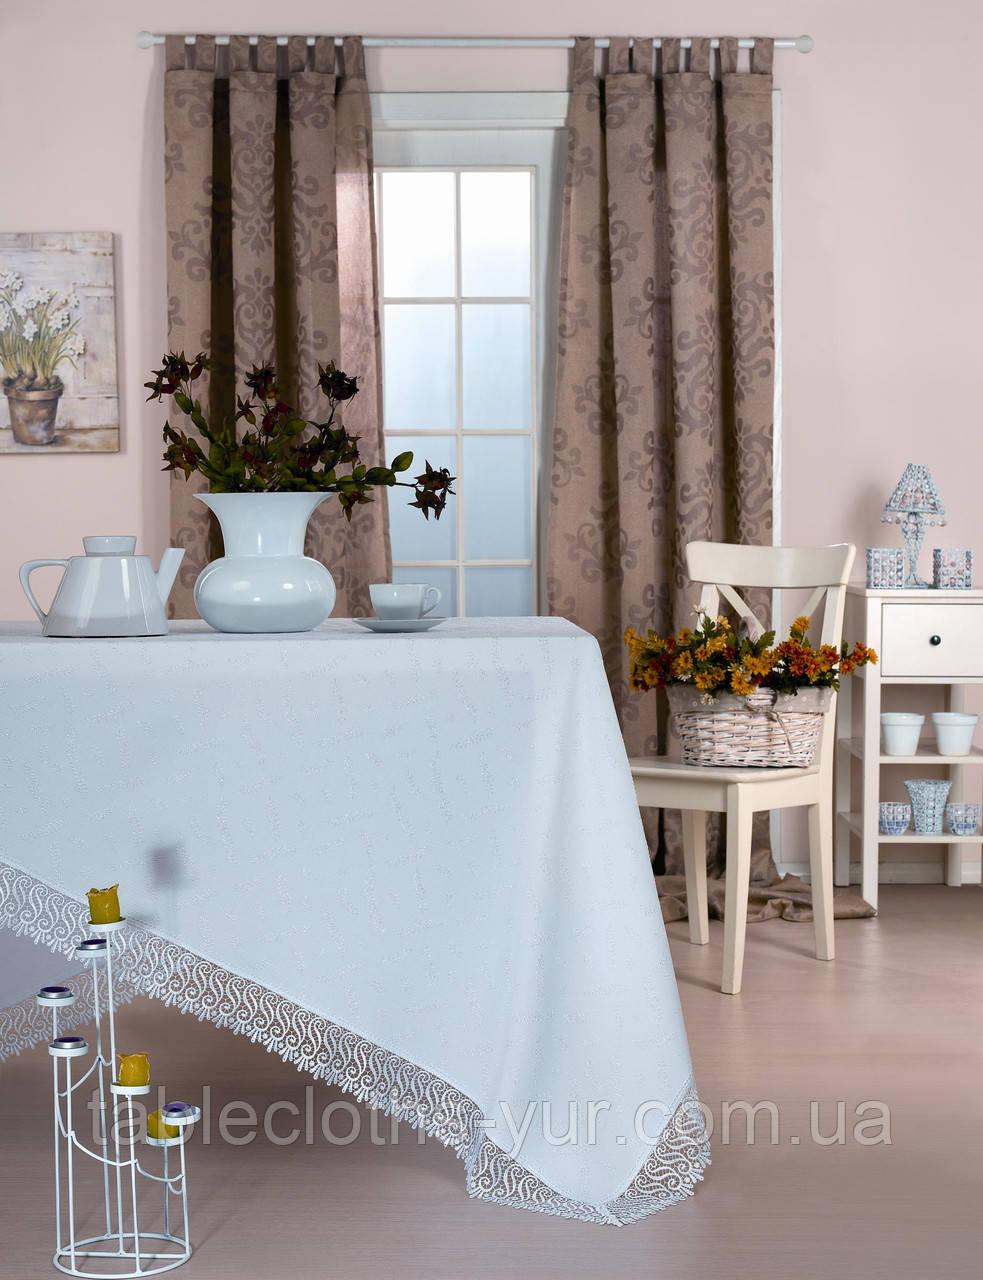 Скатерть кухонна 110 - 160